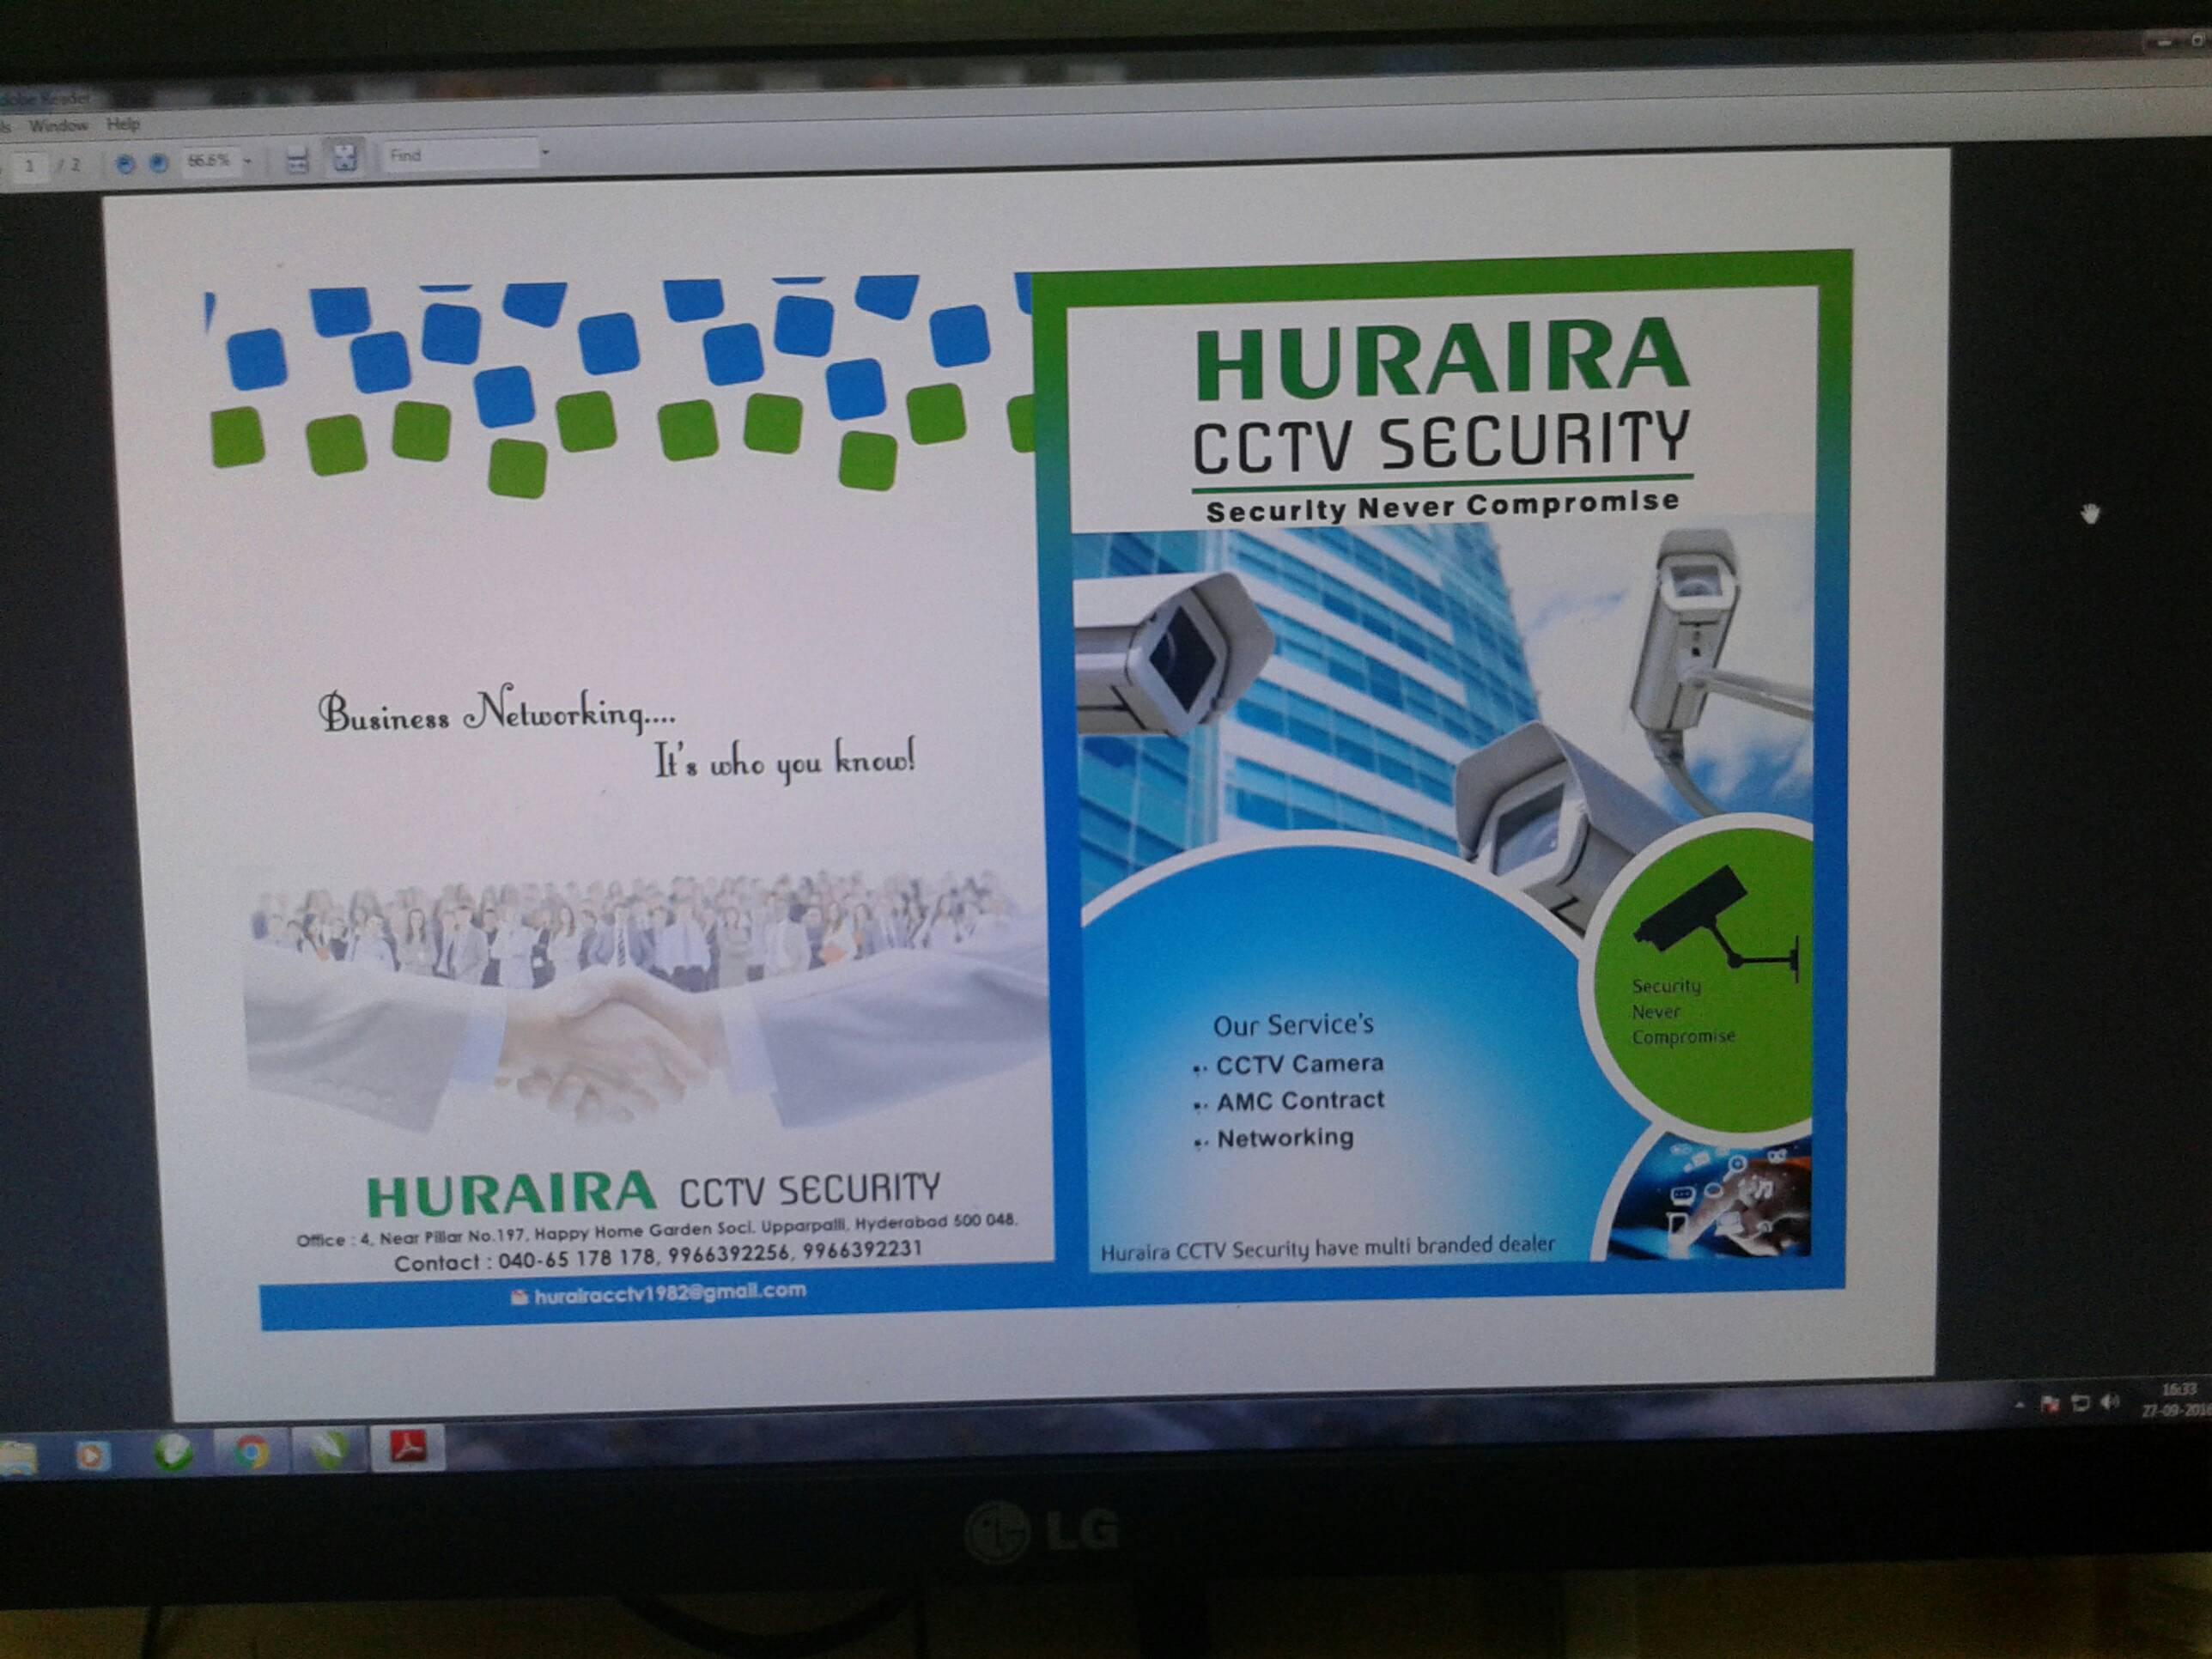 Huraira Cctv Security